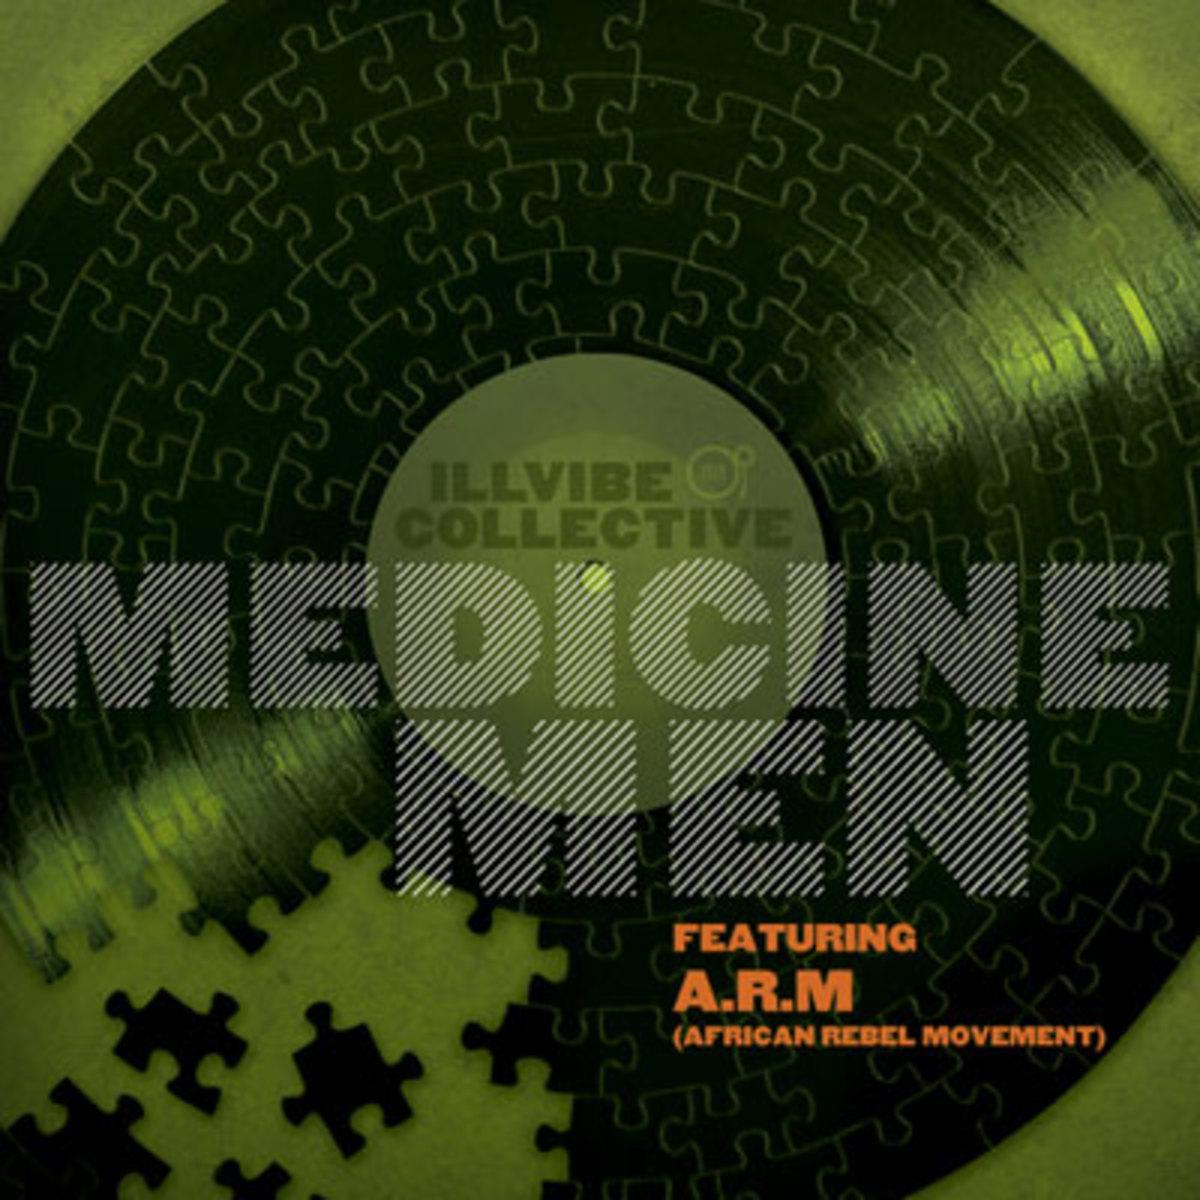 illvibe-medicinemen.jpg